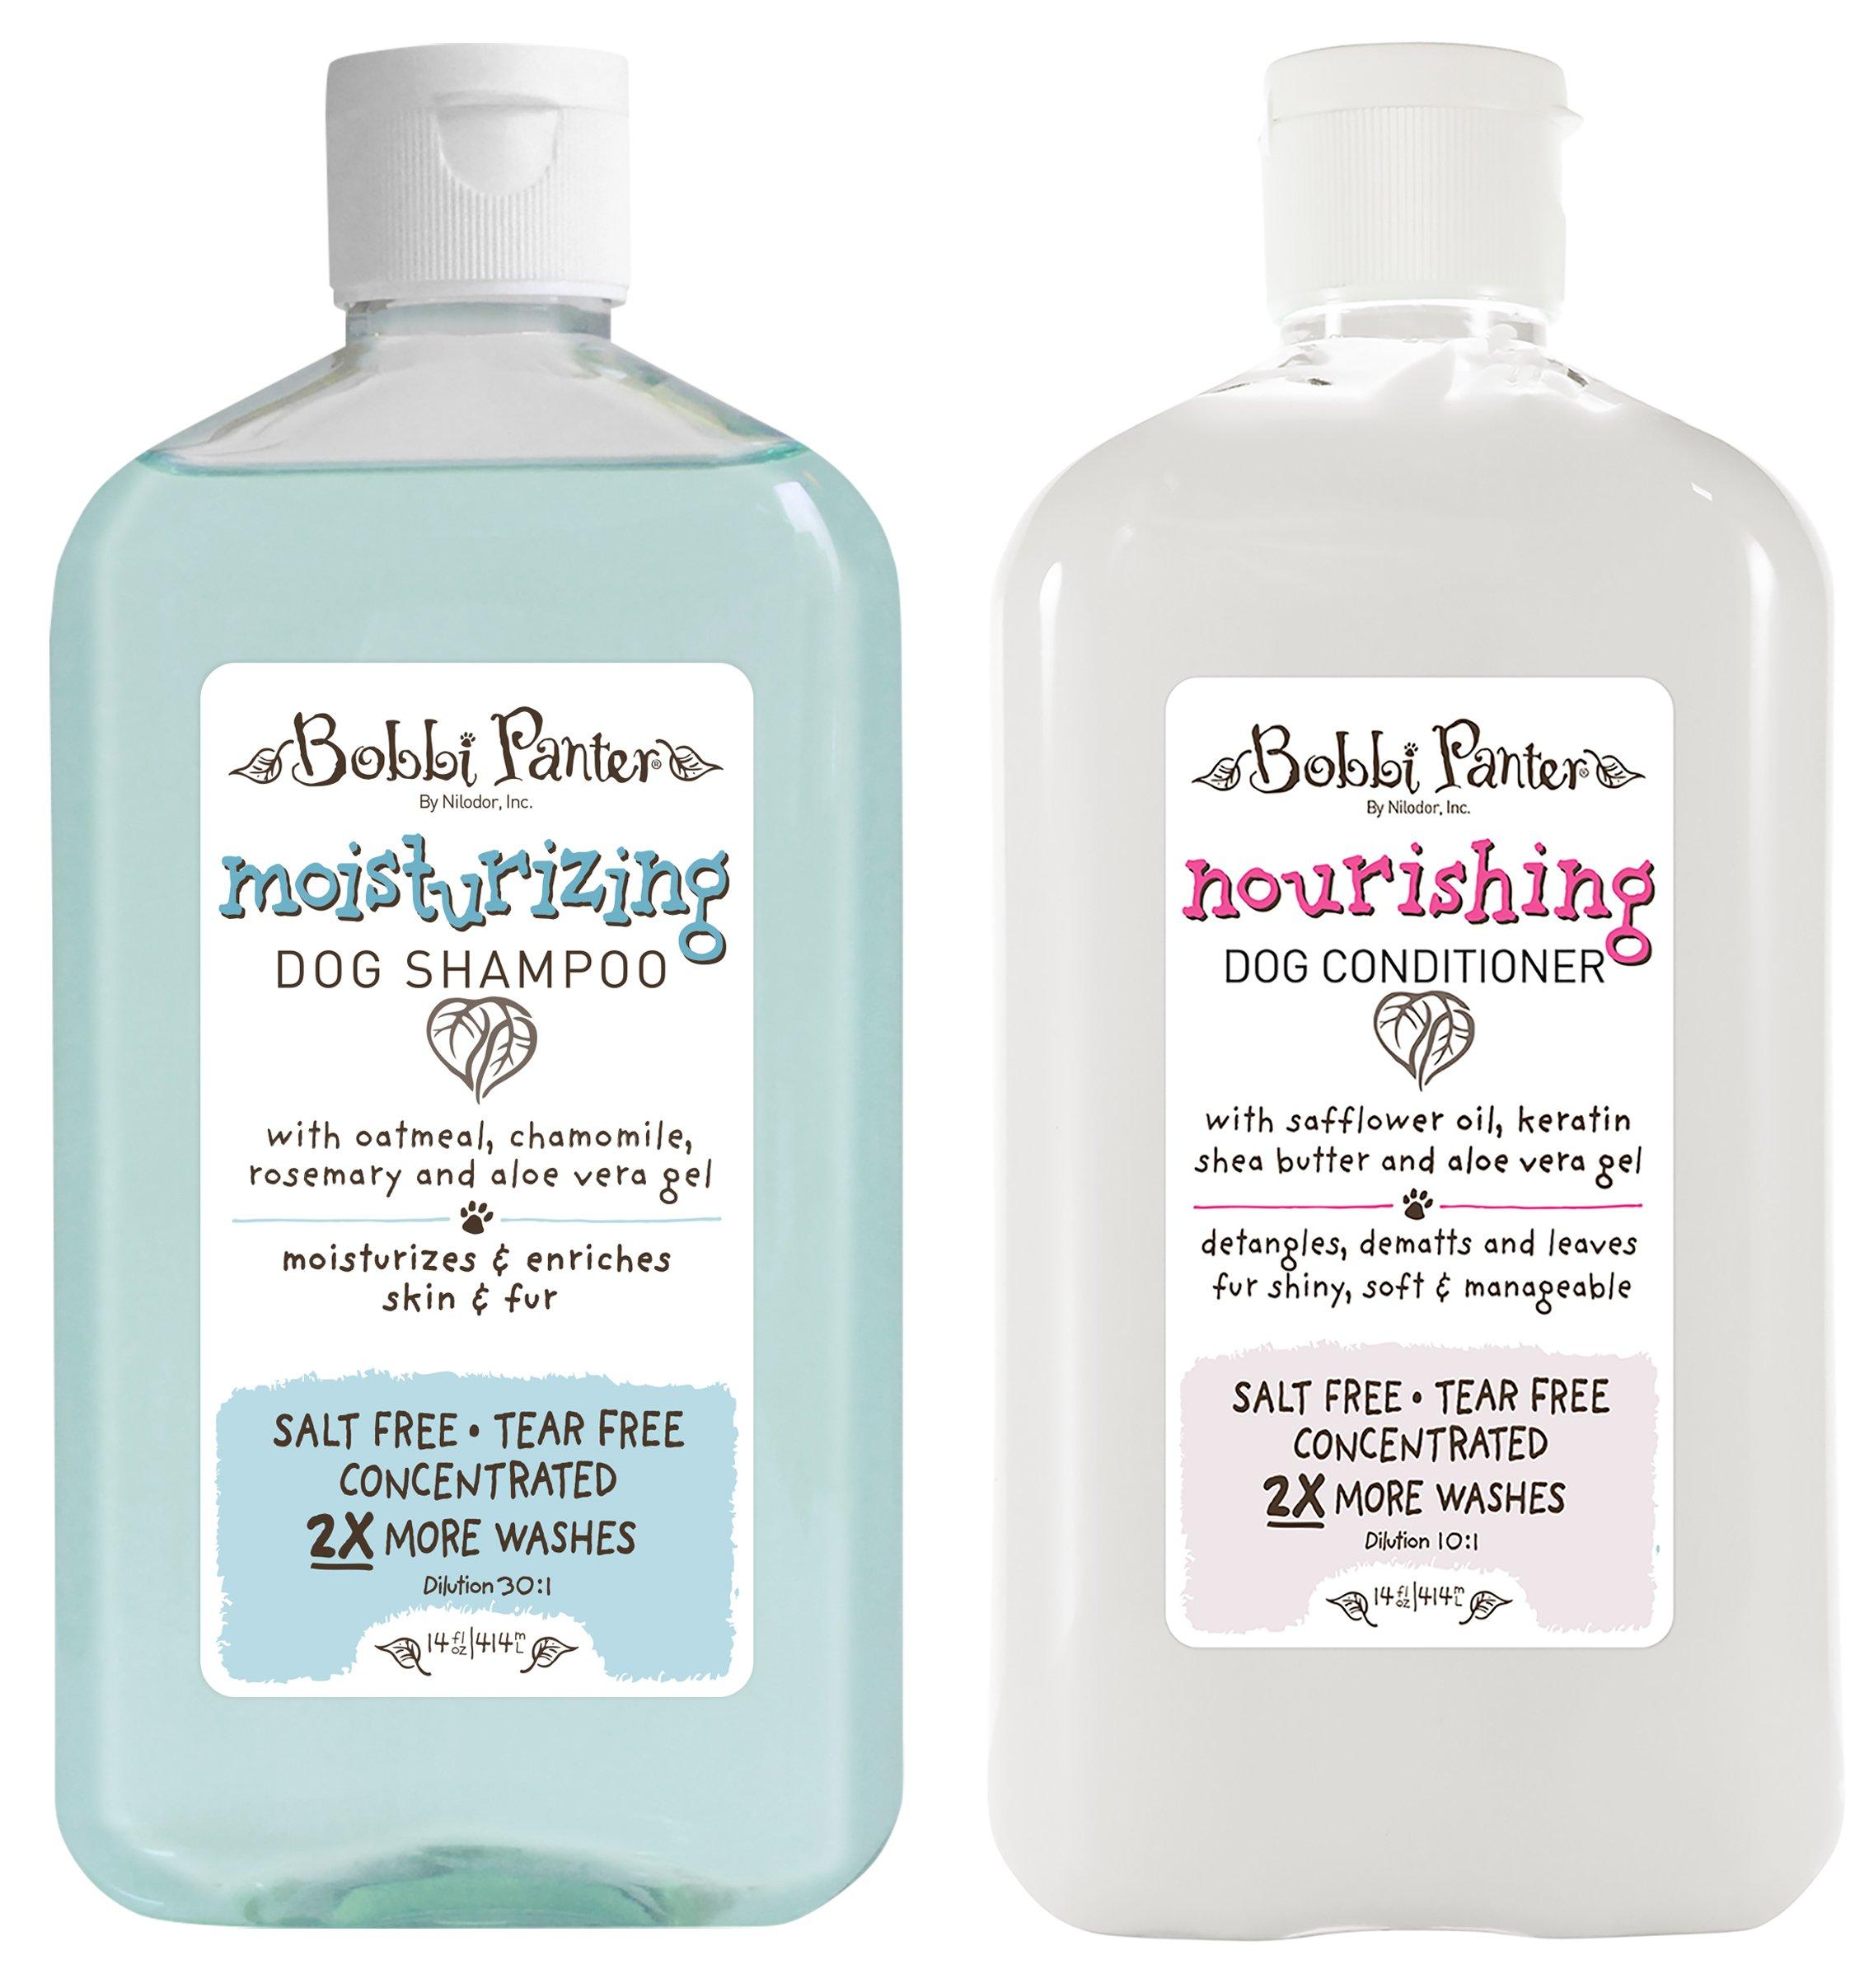 Bobbi Panter Natural Moisturizing Dog Shampoo and Nourishing Conditioner by Bobbi Panter